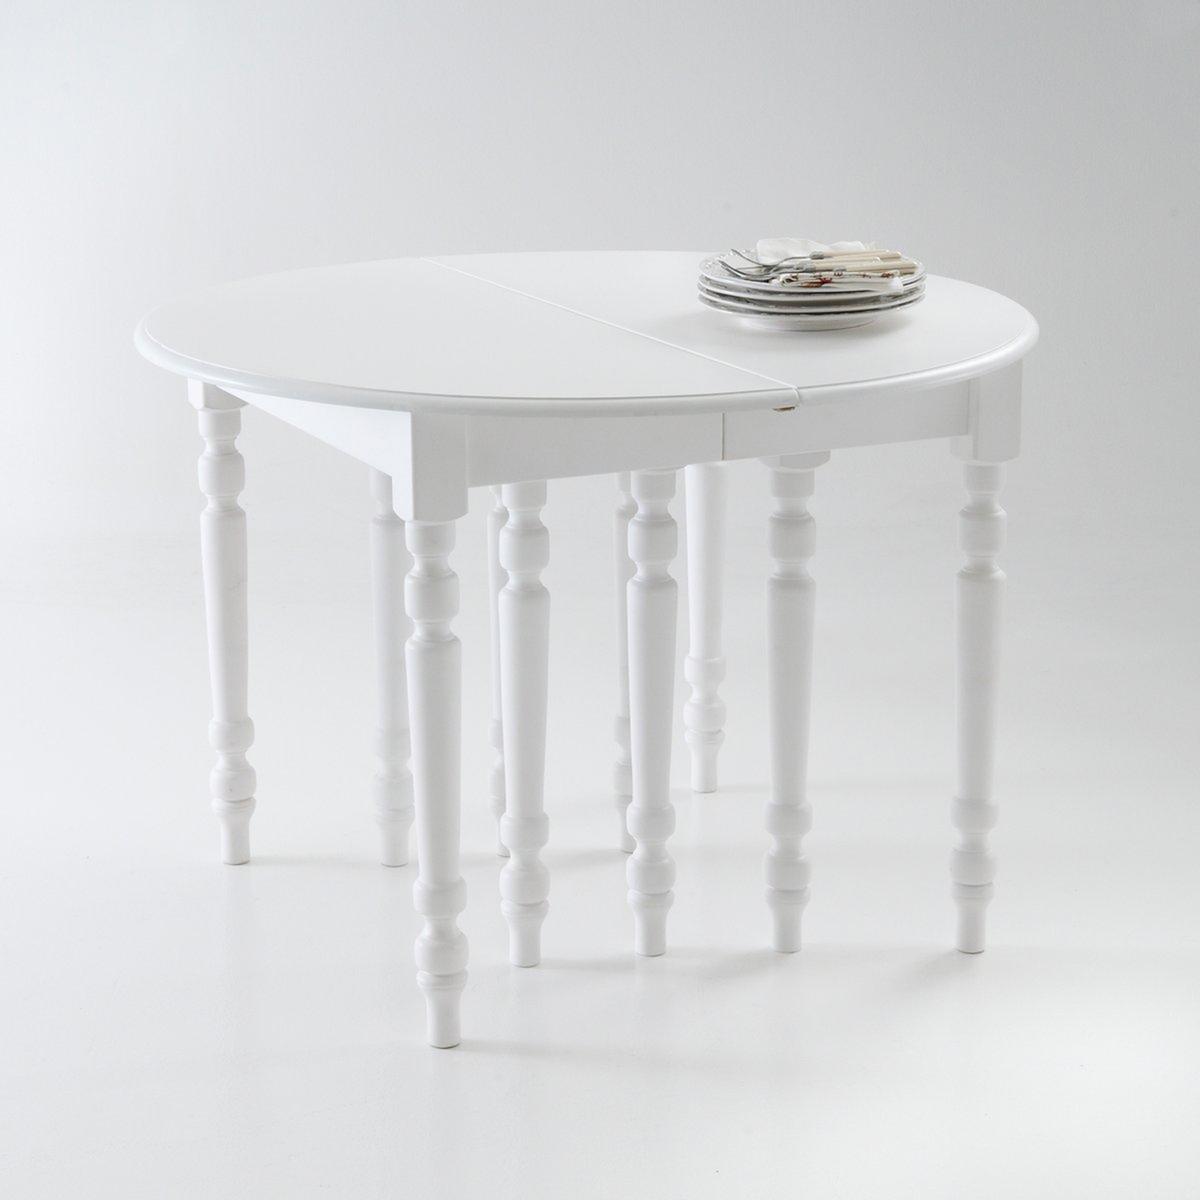 Стол LaRedoute Обеденный на 4-16 персон Authentic Style 16 персоны белый круглый laredoute стол на 4 8 персон authentic style 8 персоны белый